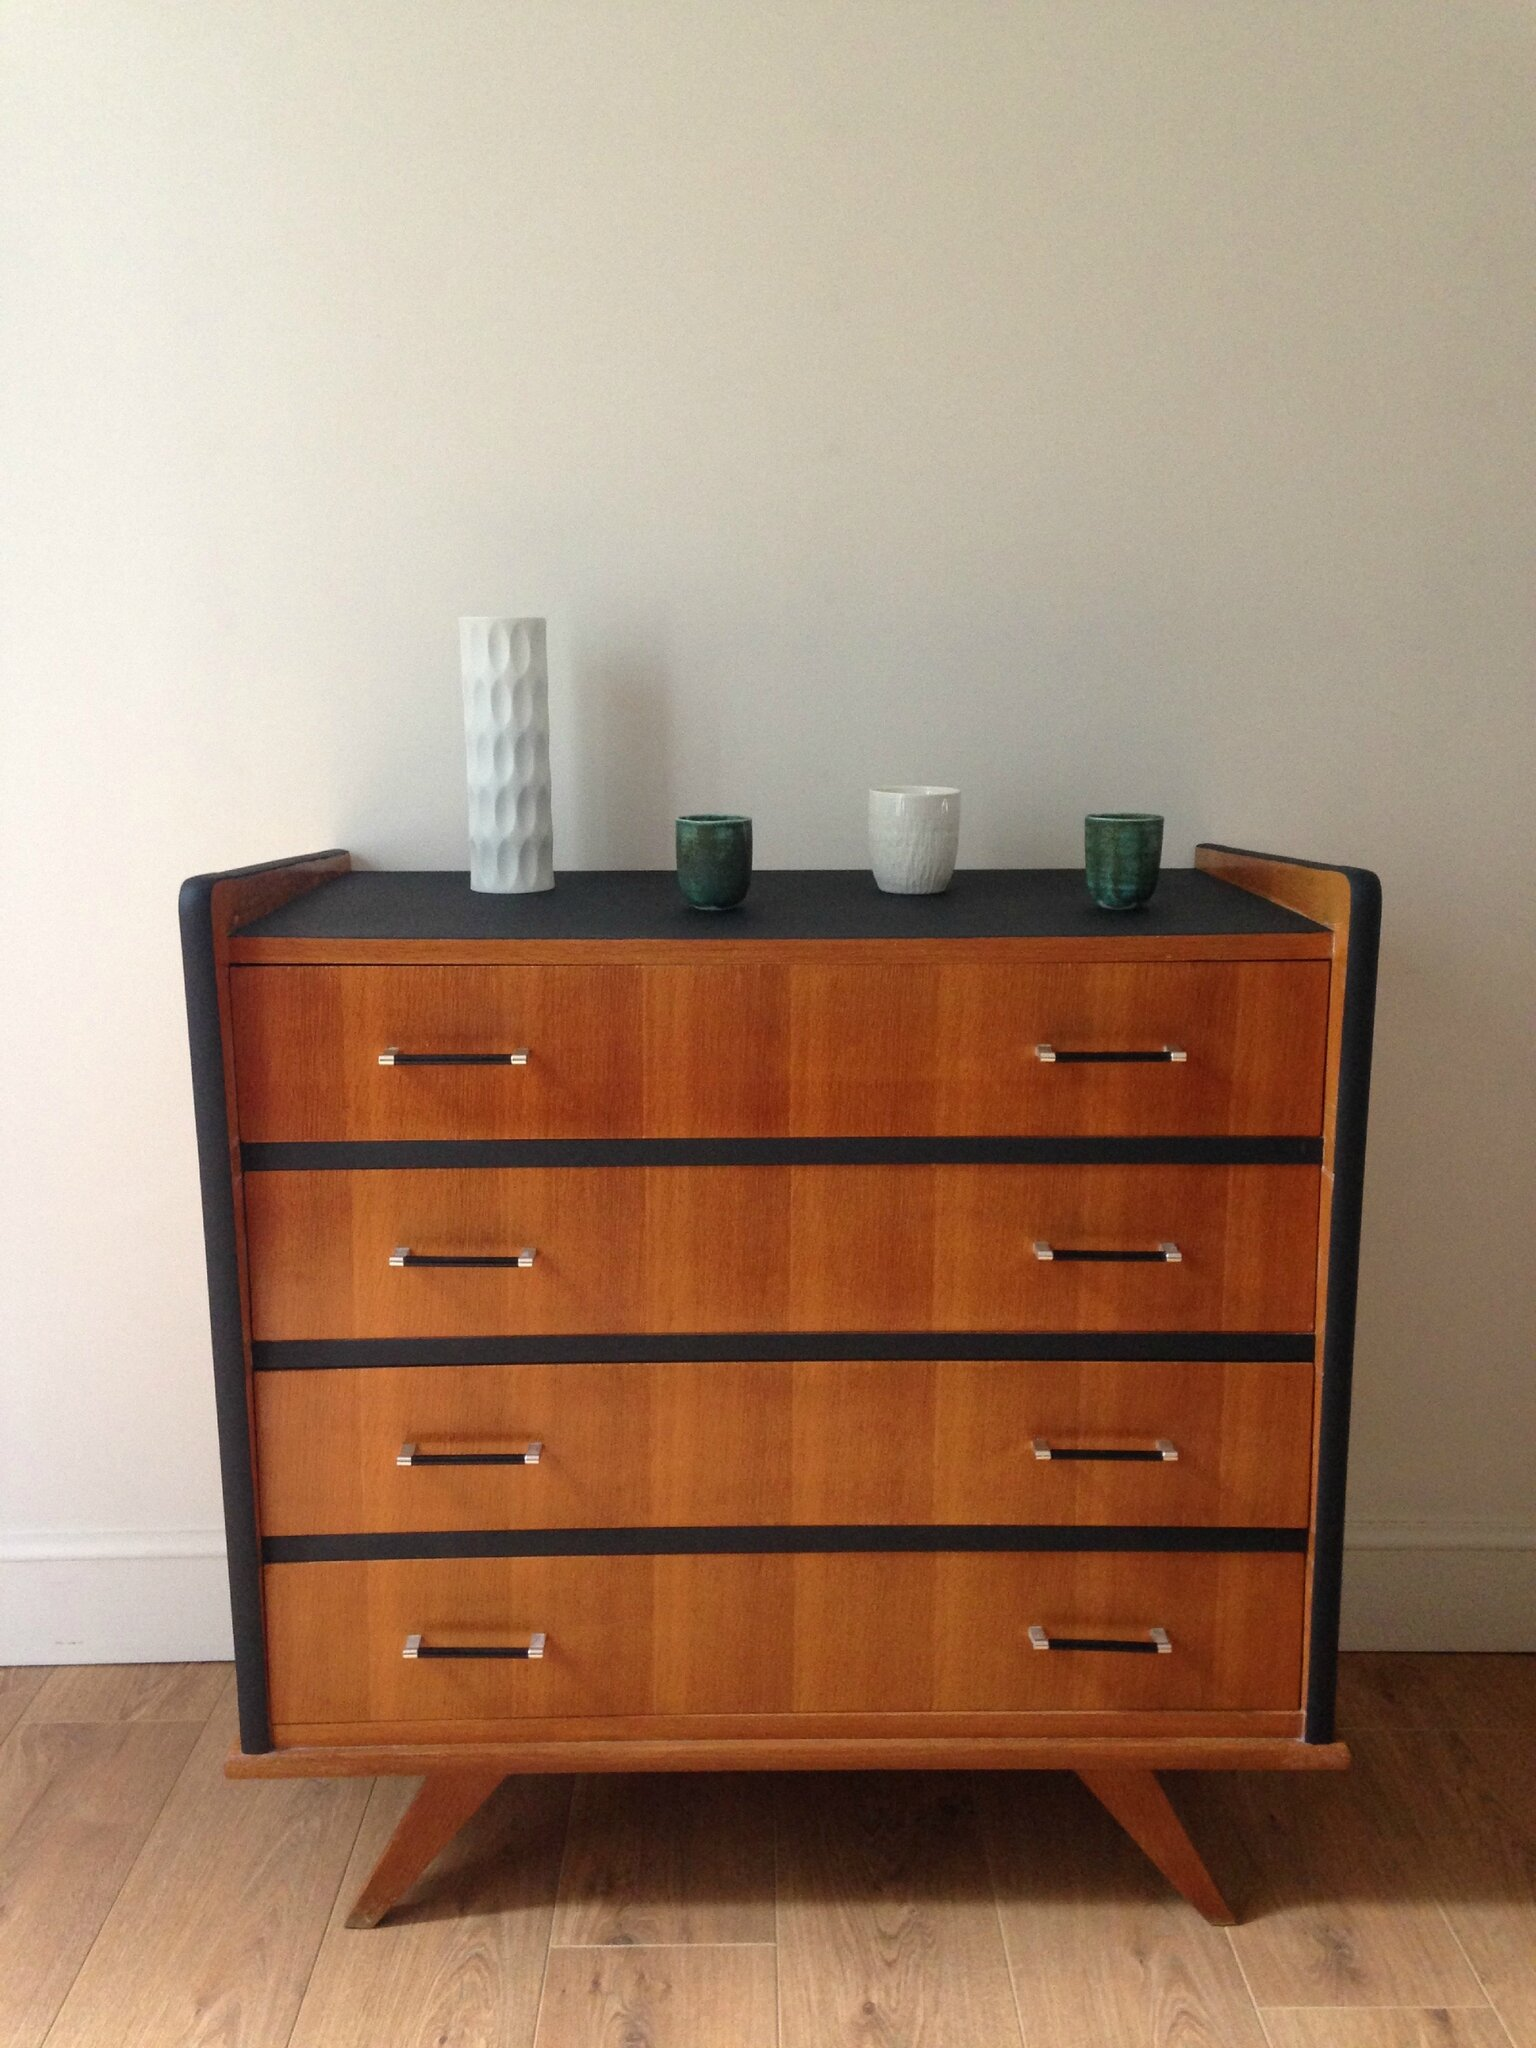 commode monsieur meuble commode uumonsieur bohouu. Black Bedroom Furniture Sets. Home Design Ideas